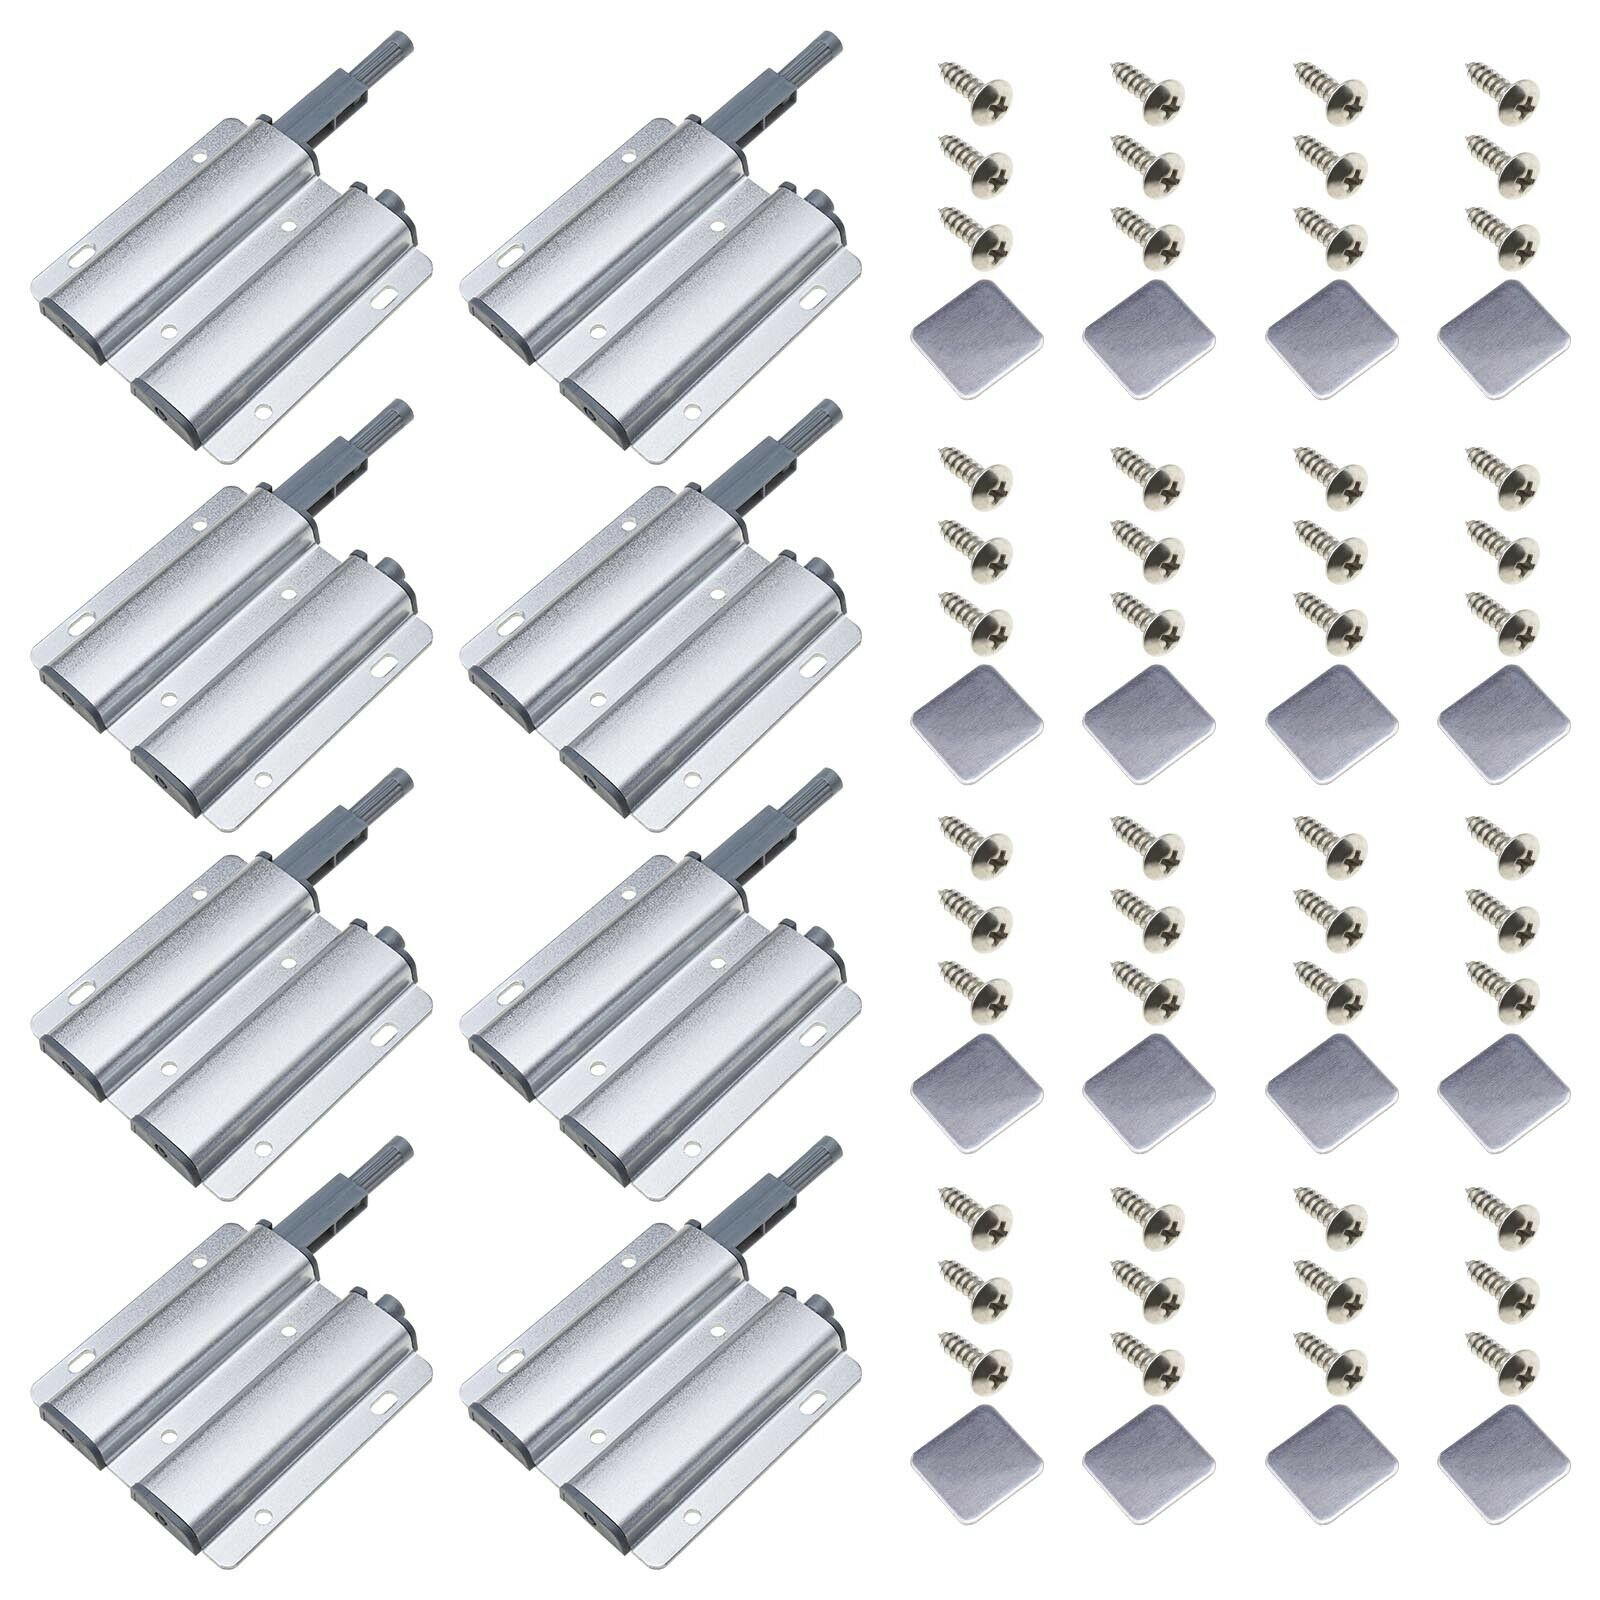 8 set doble cabeza-magnetschiebeverschlüsse para armarios cajones amortiguadores de búfer